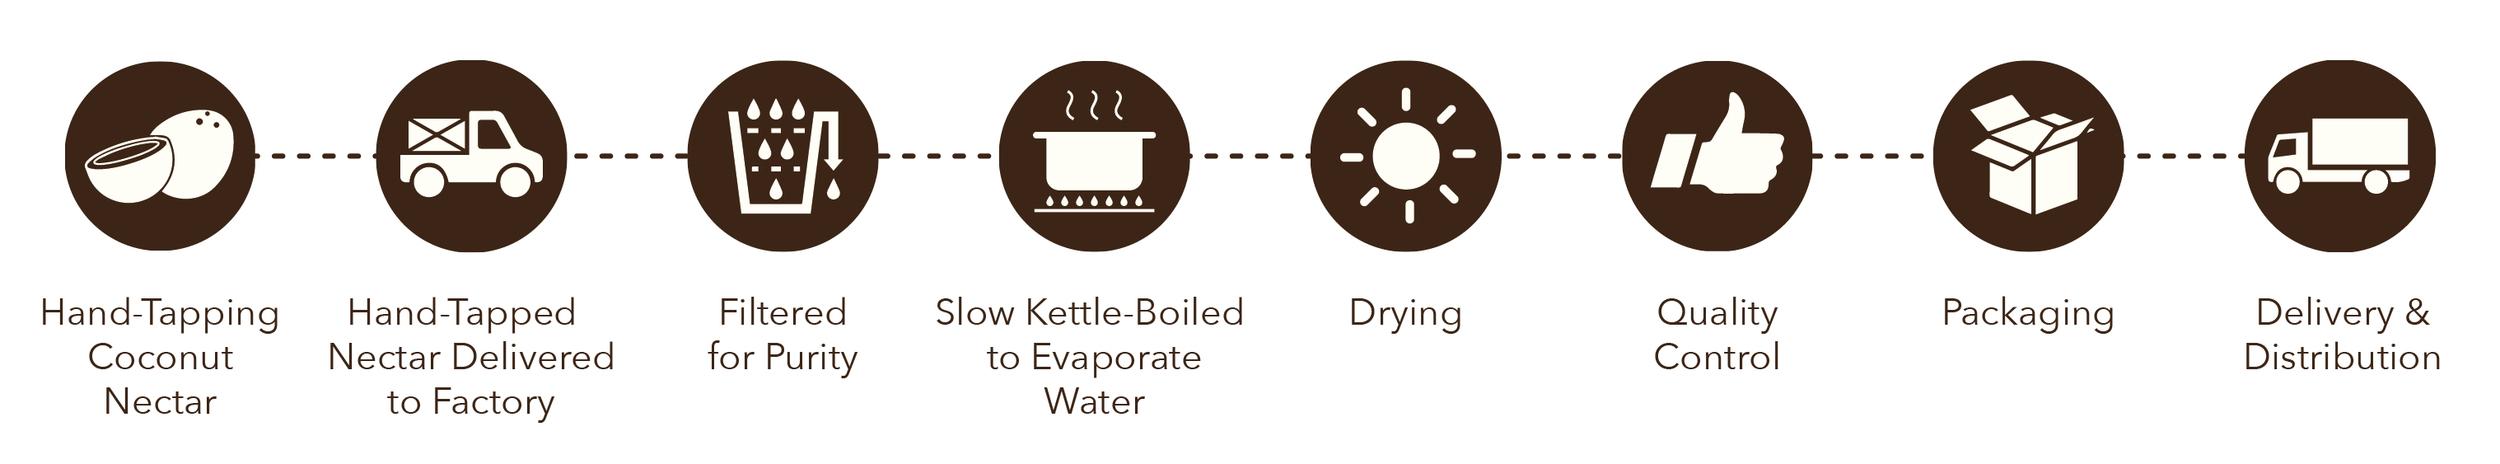 coconut-sugar-manufacturing-process.jpg